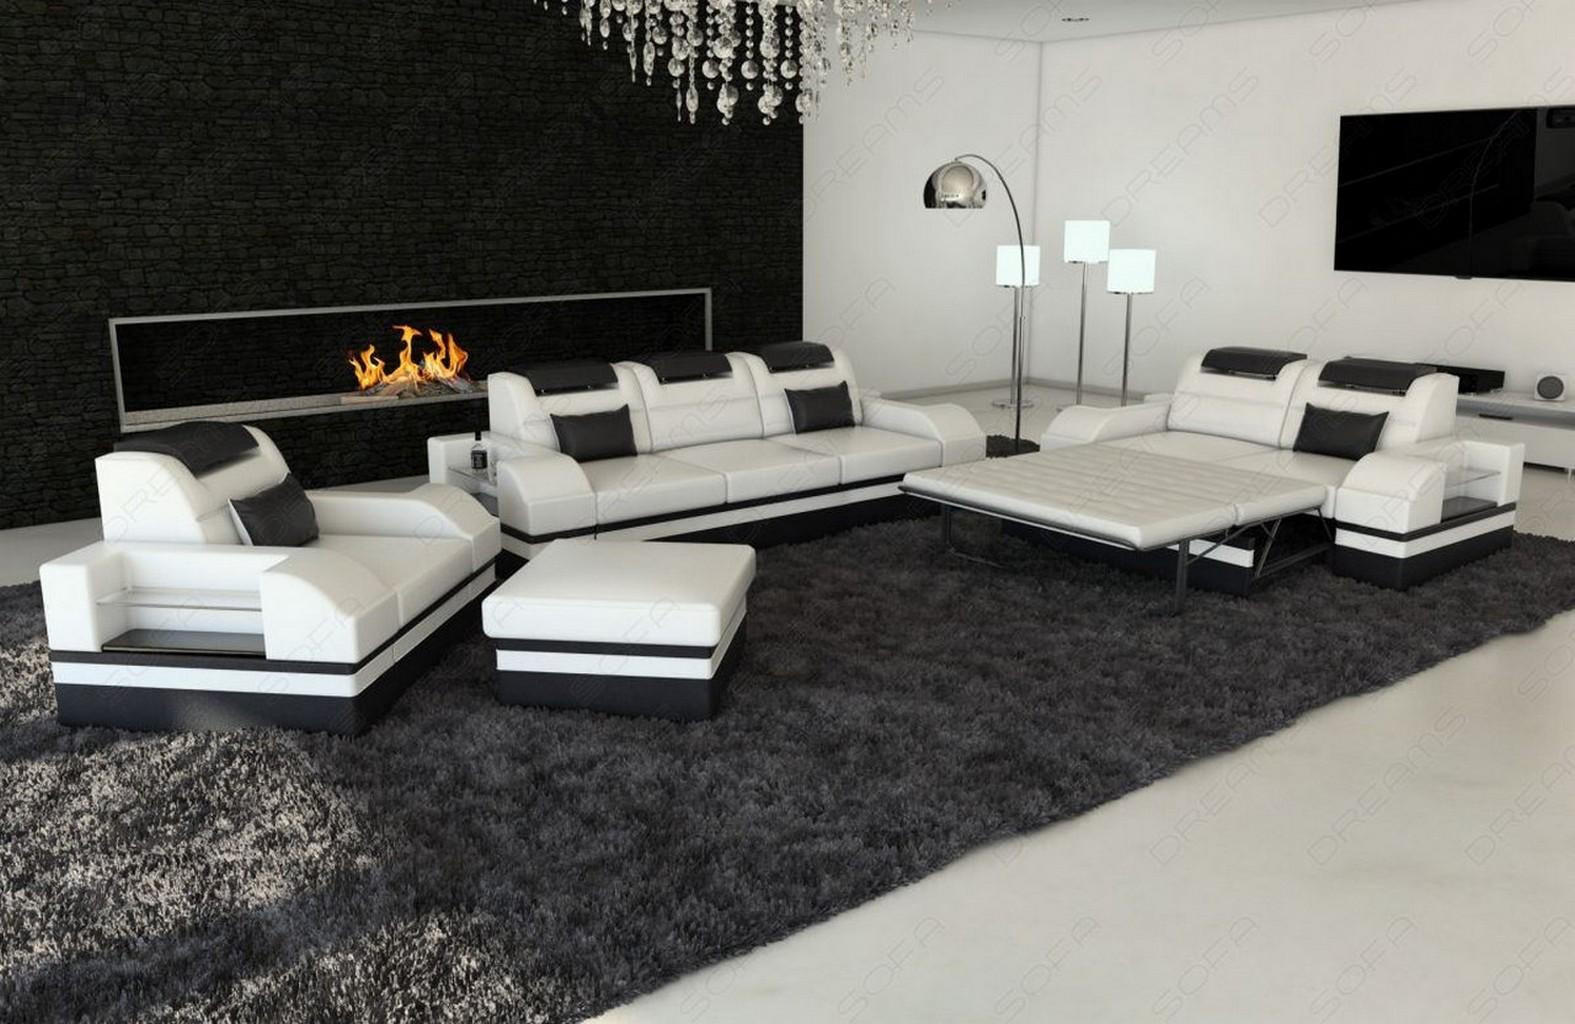 sofa set parma 3 2 chair led leather sofa orange. Black Bedroom Furniture Sets. Home Design Ideas